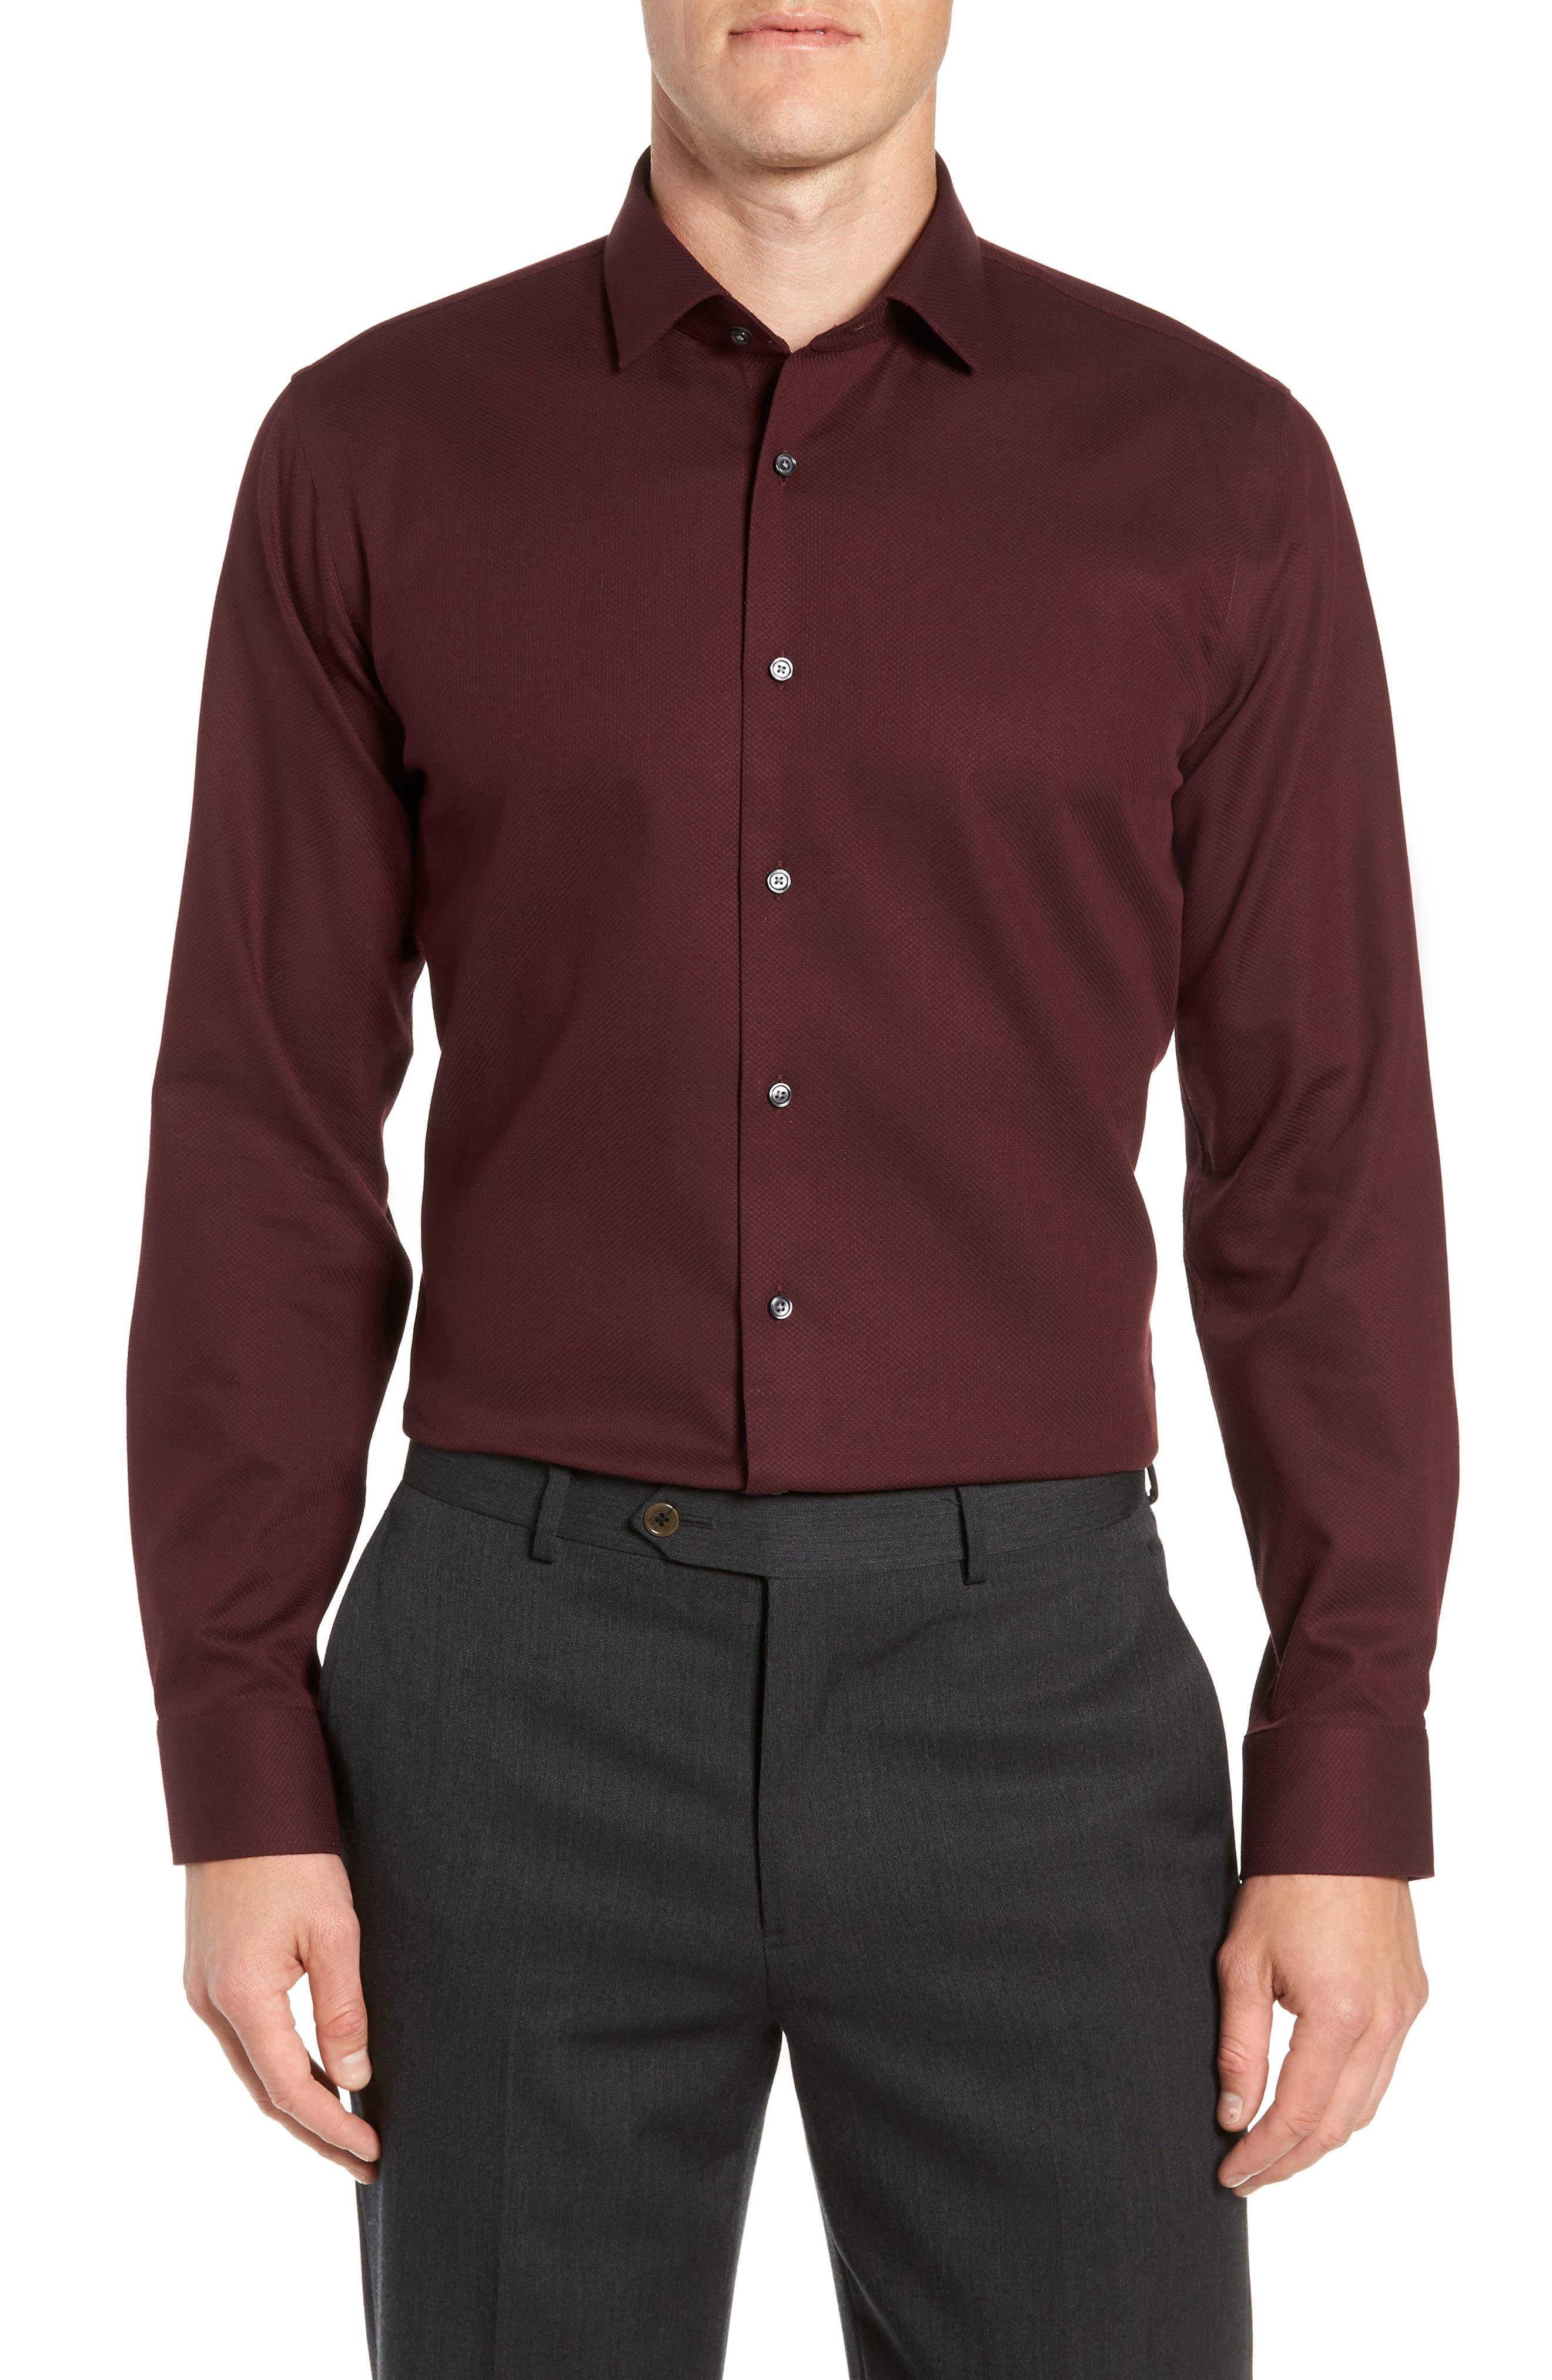 Trim Fit Non-Iron Solid Dress Shirt, Main, color, BURGUNDY ROYALE